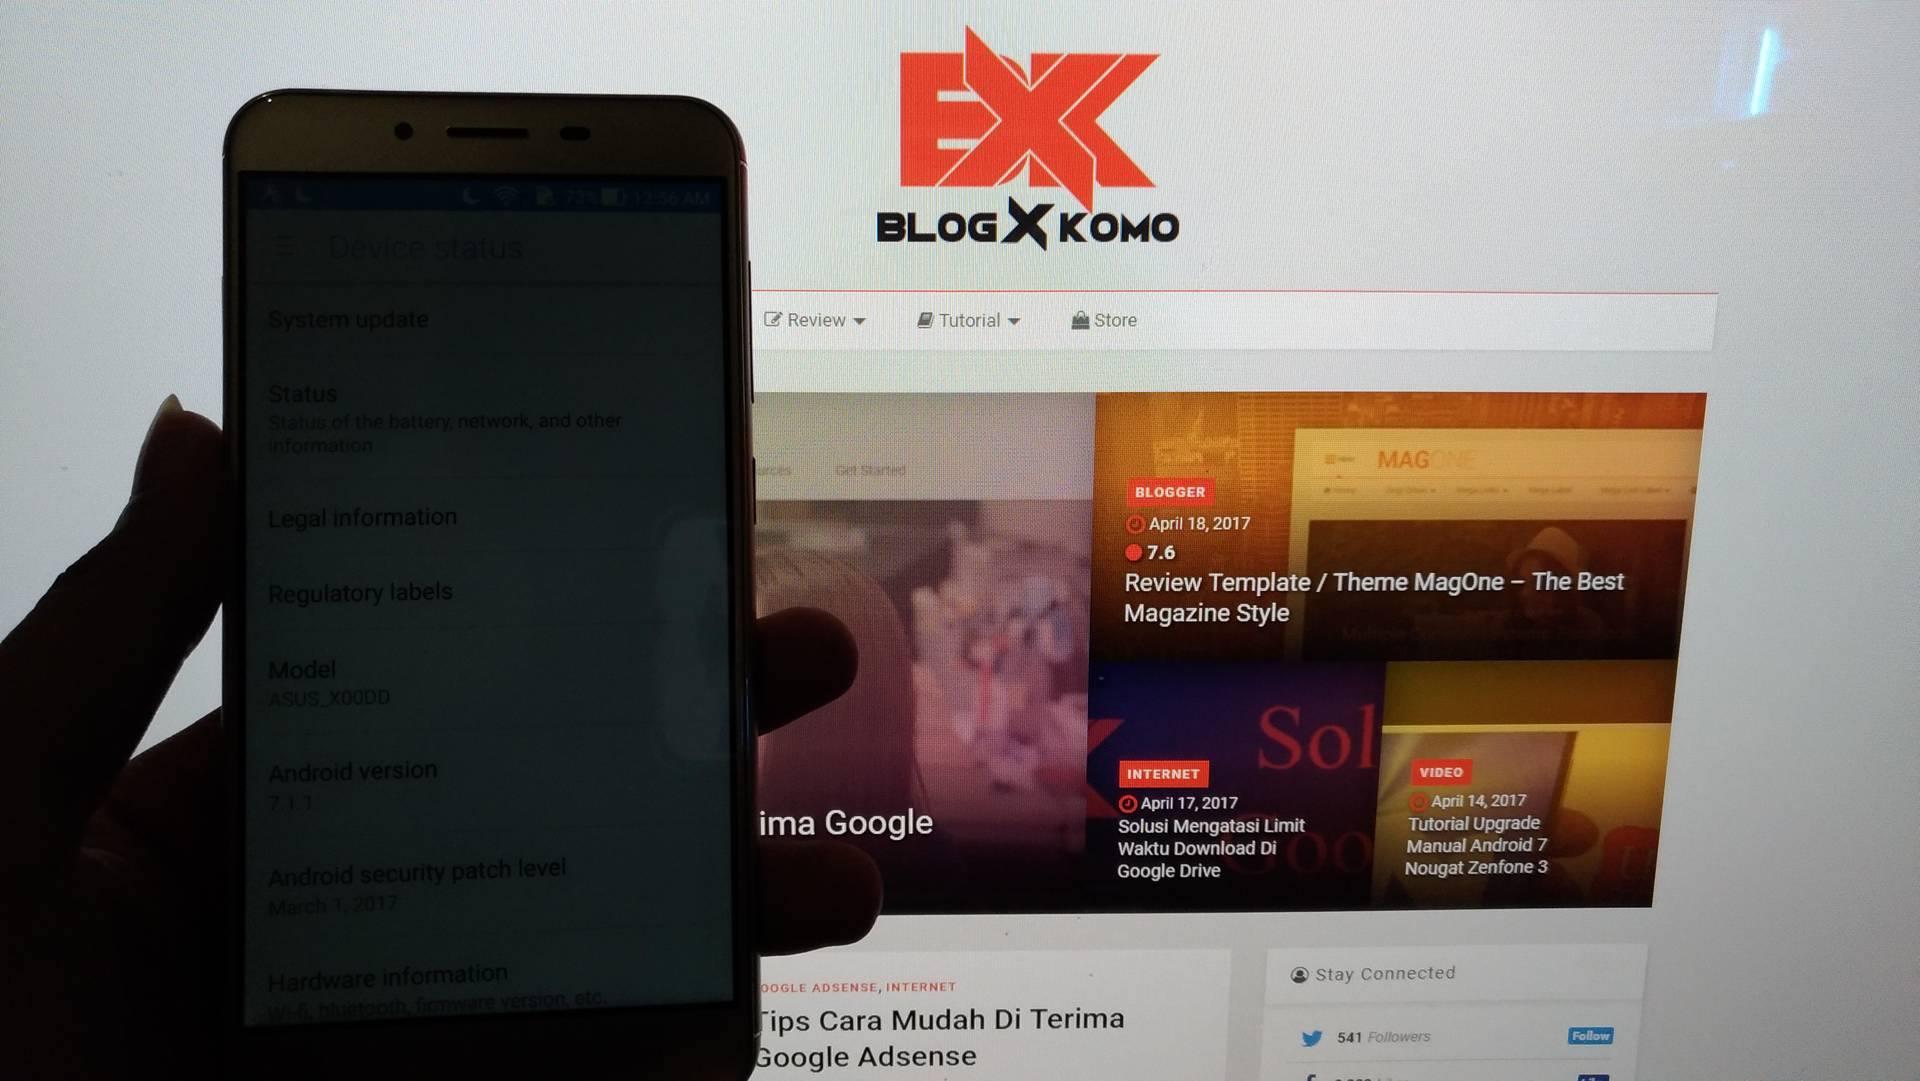 Asus Zenfone Max Pro M2 Android 9 Pie Os Update Now – Fondos de Pantalla